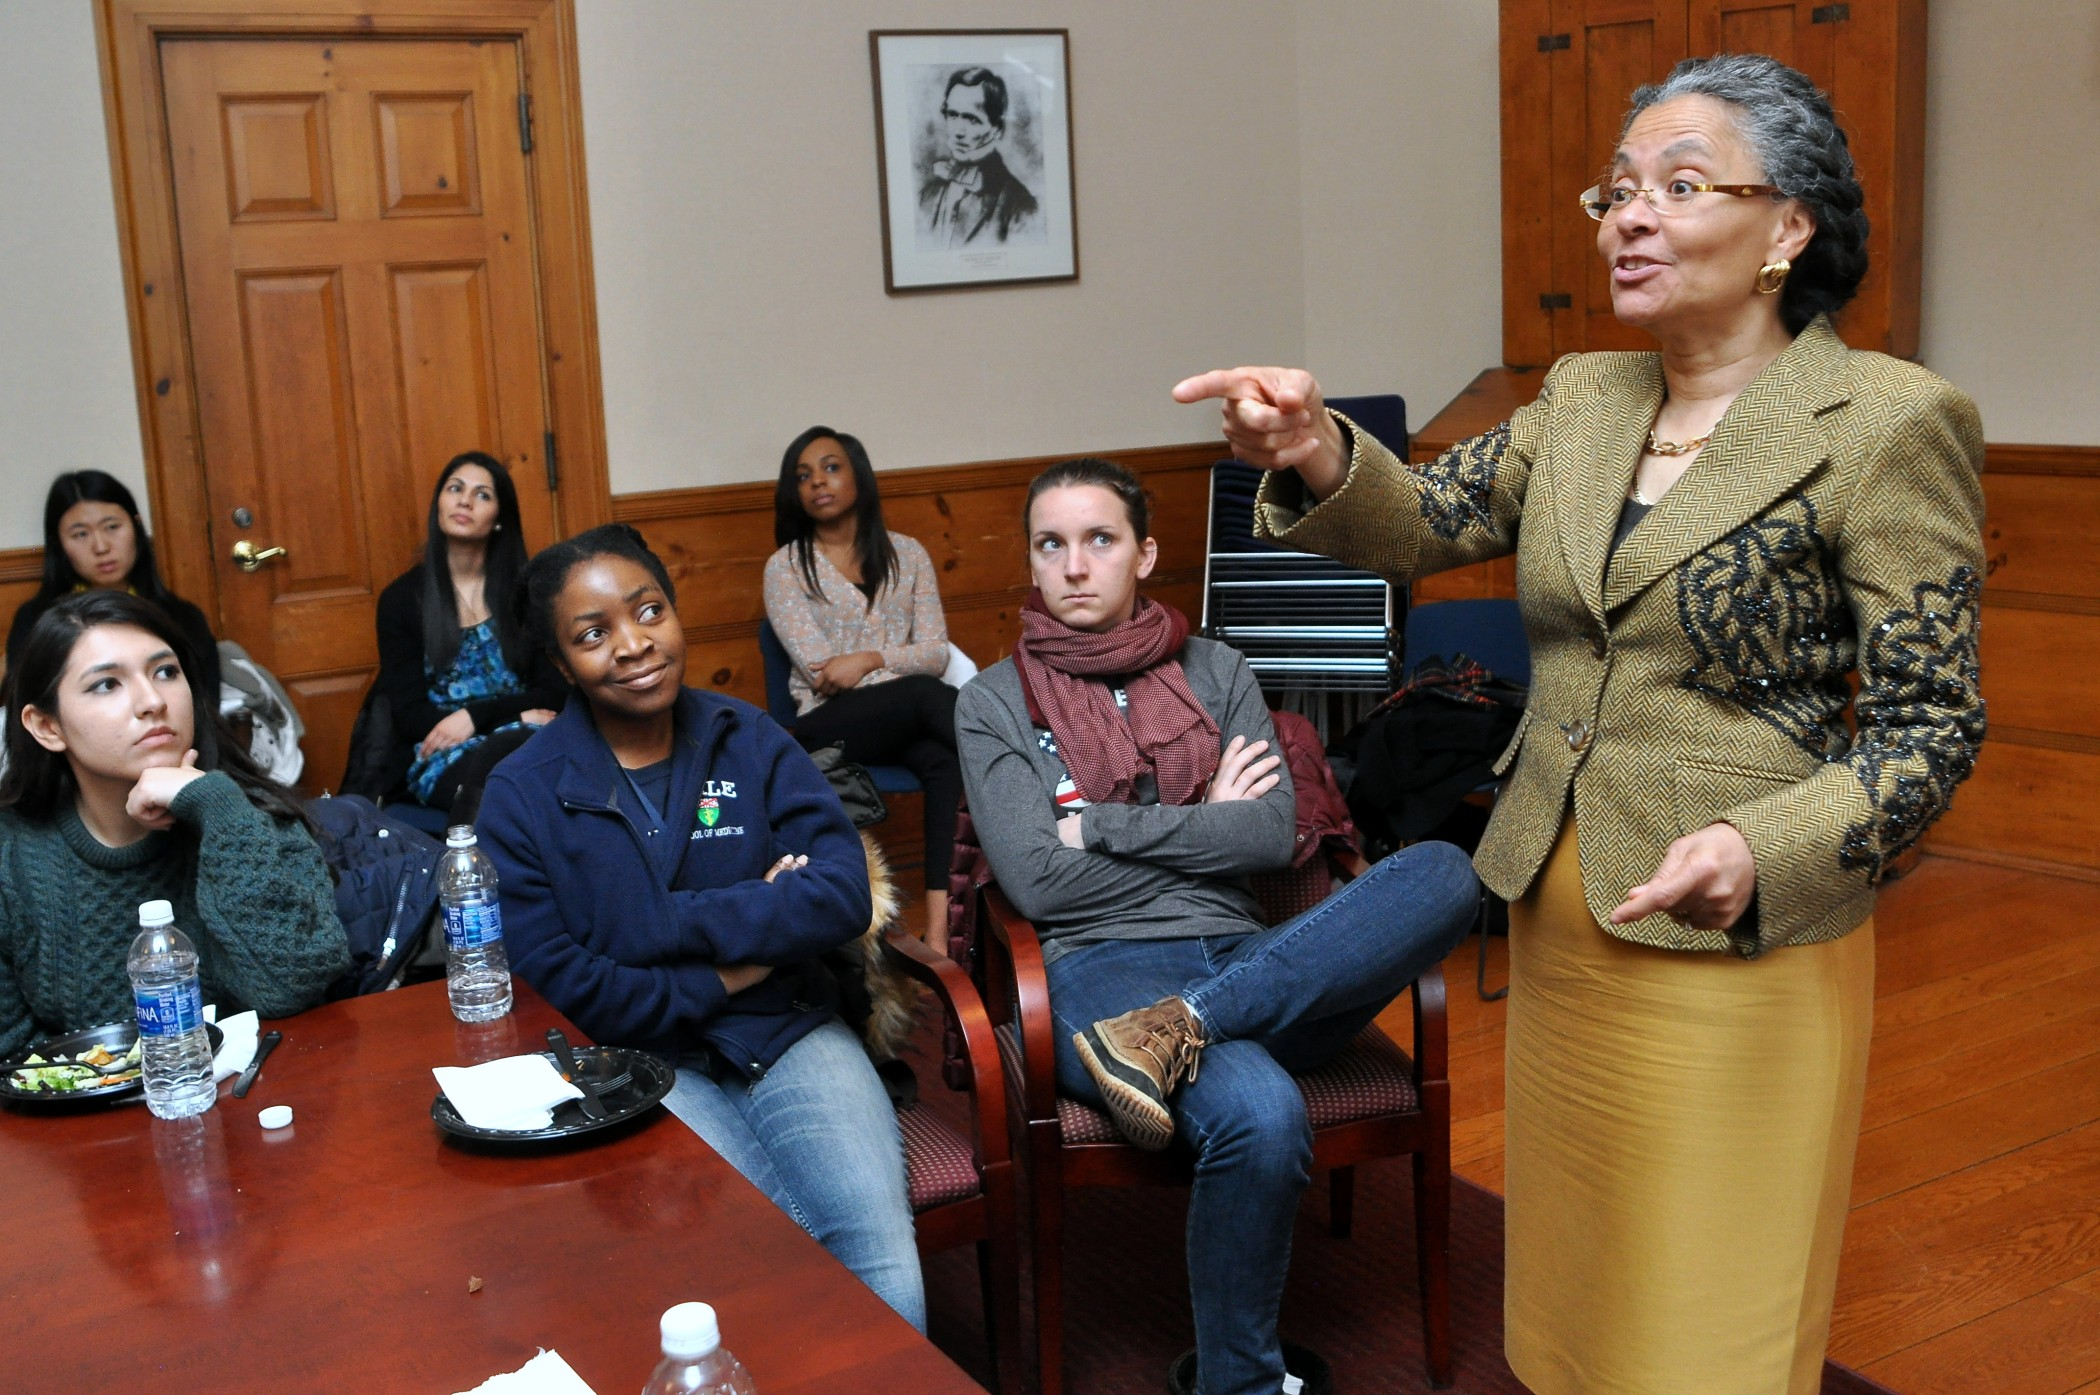 Camara Jones on racism in health care